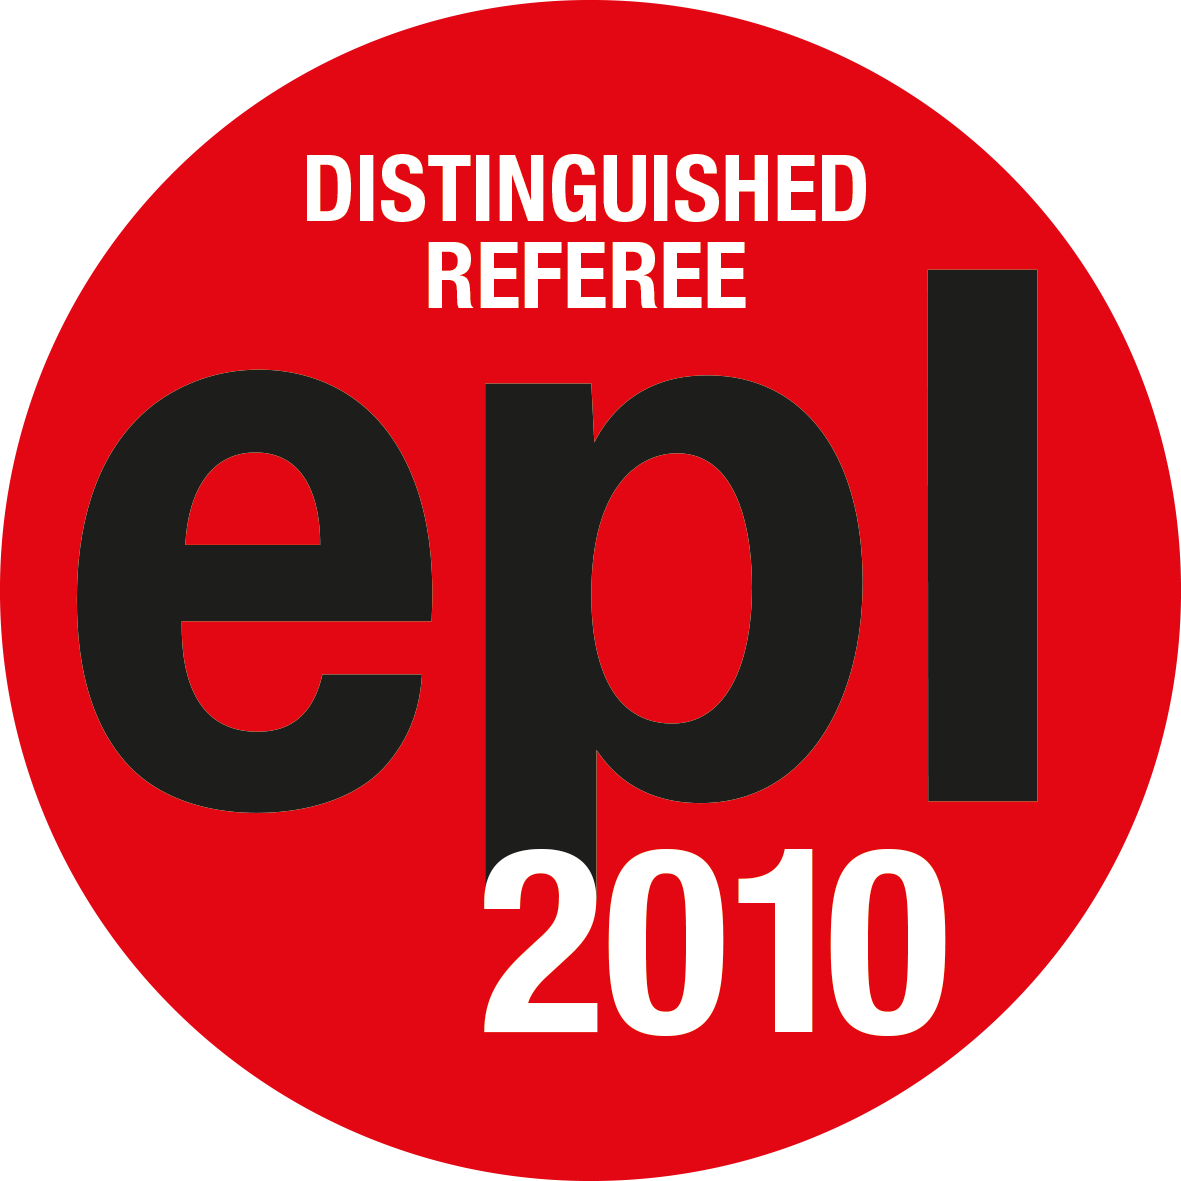 EPL Distinguished Referees 2010